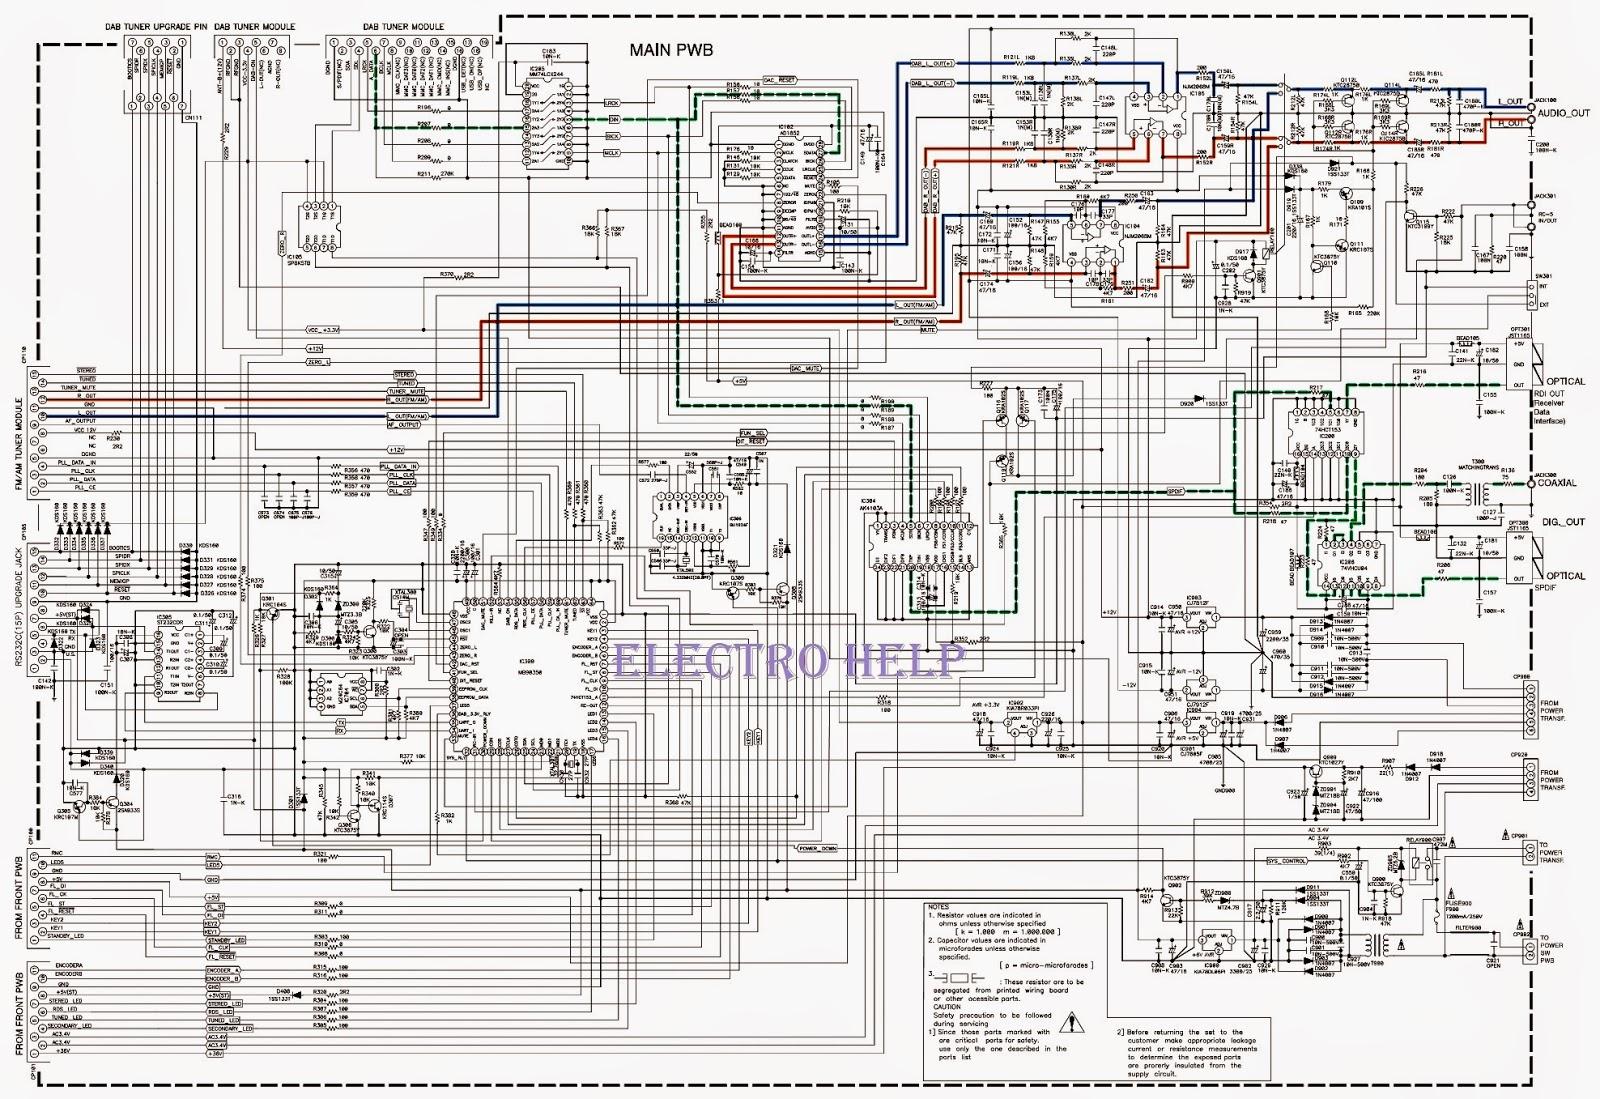 Electro Help  Marantz St-15s1 - How To Enter Service Mode - Circuit Diagram